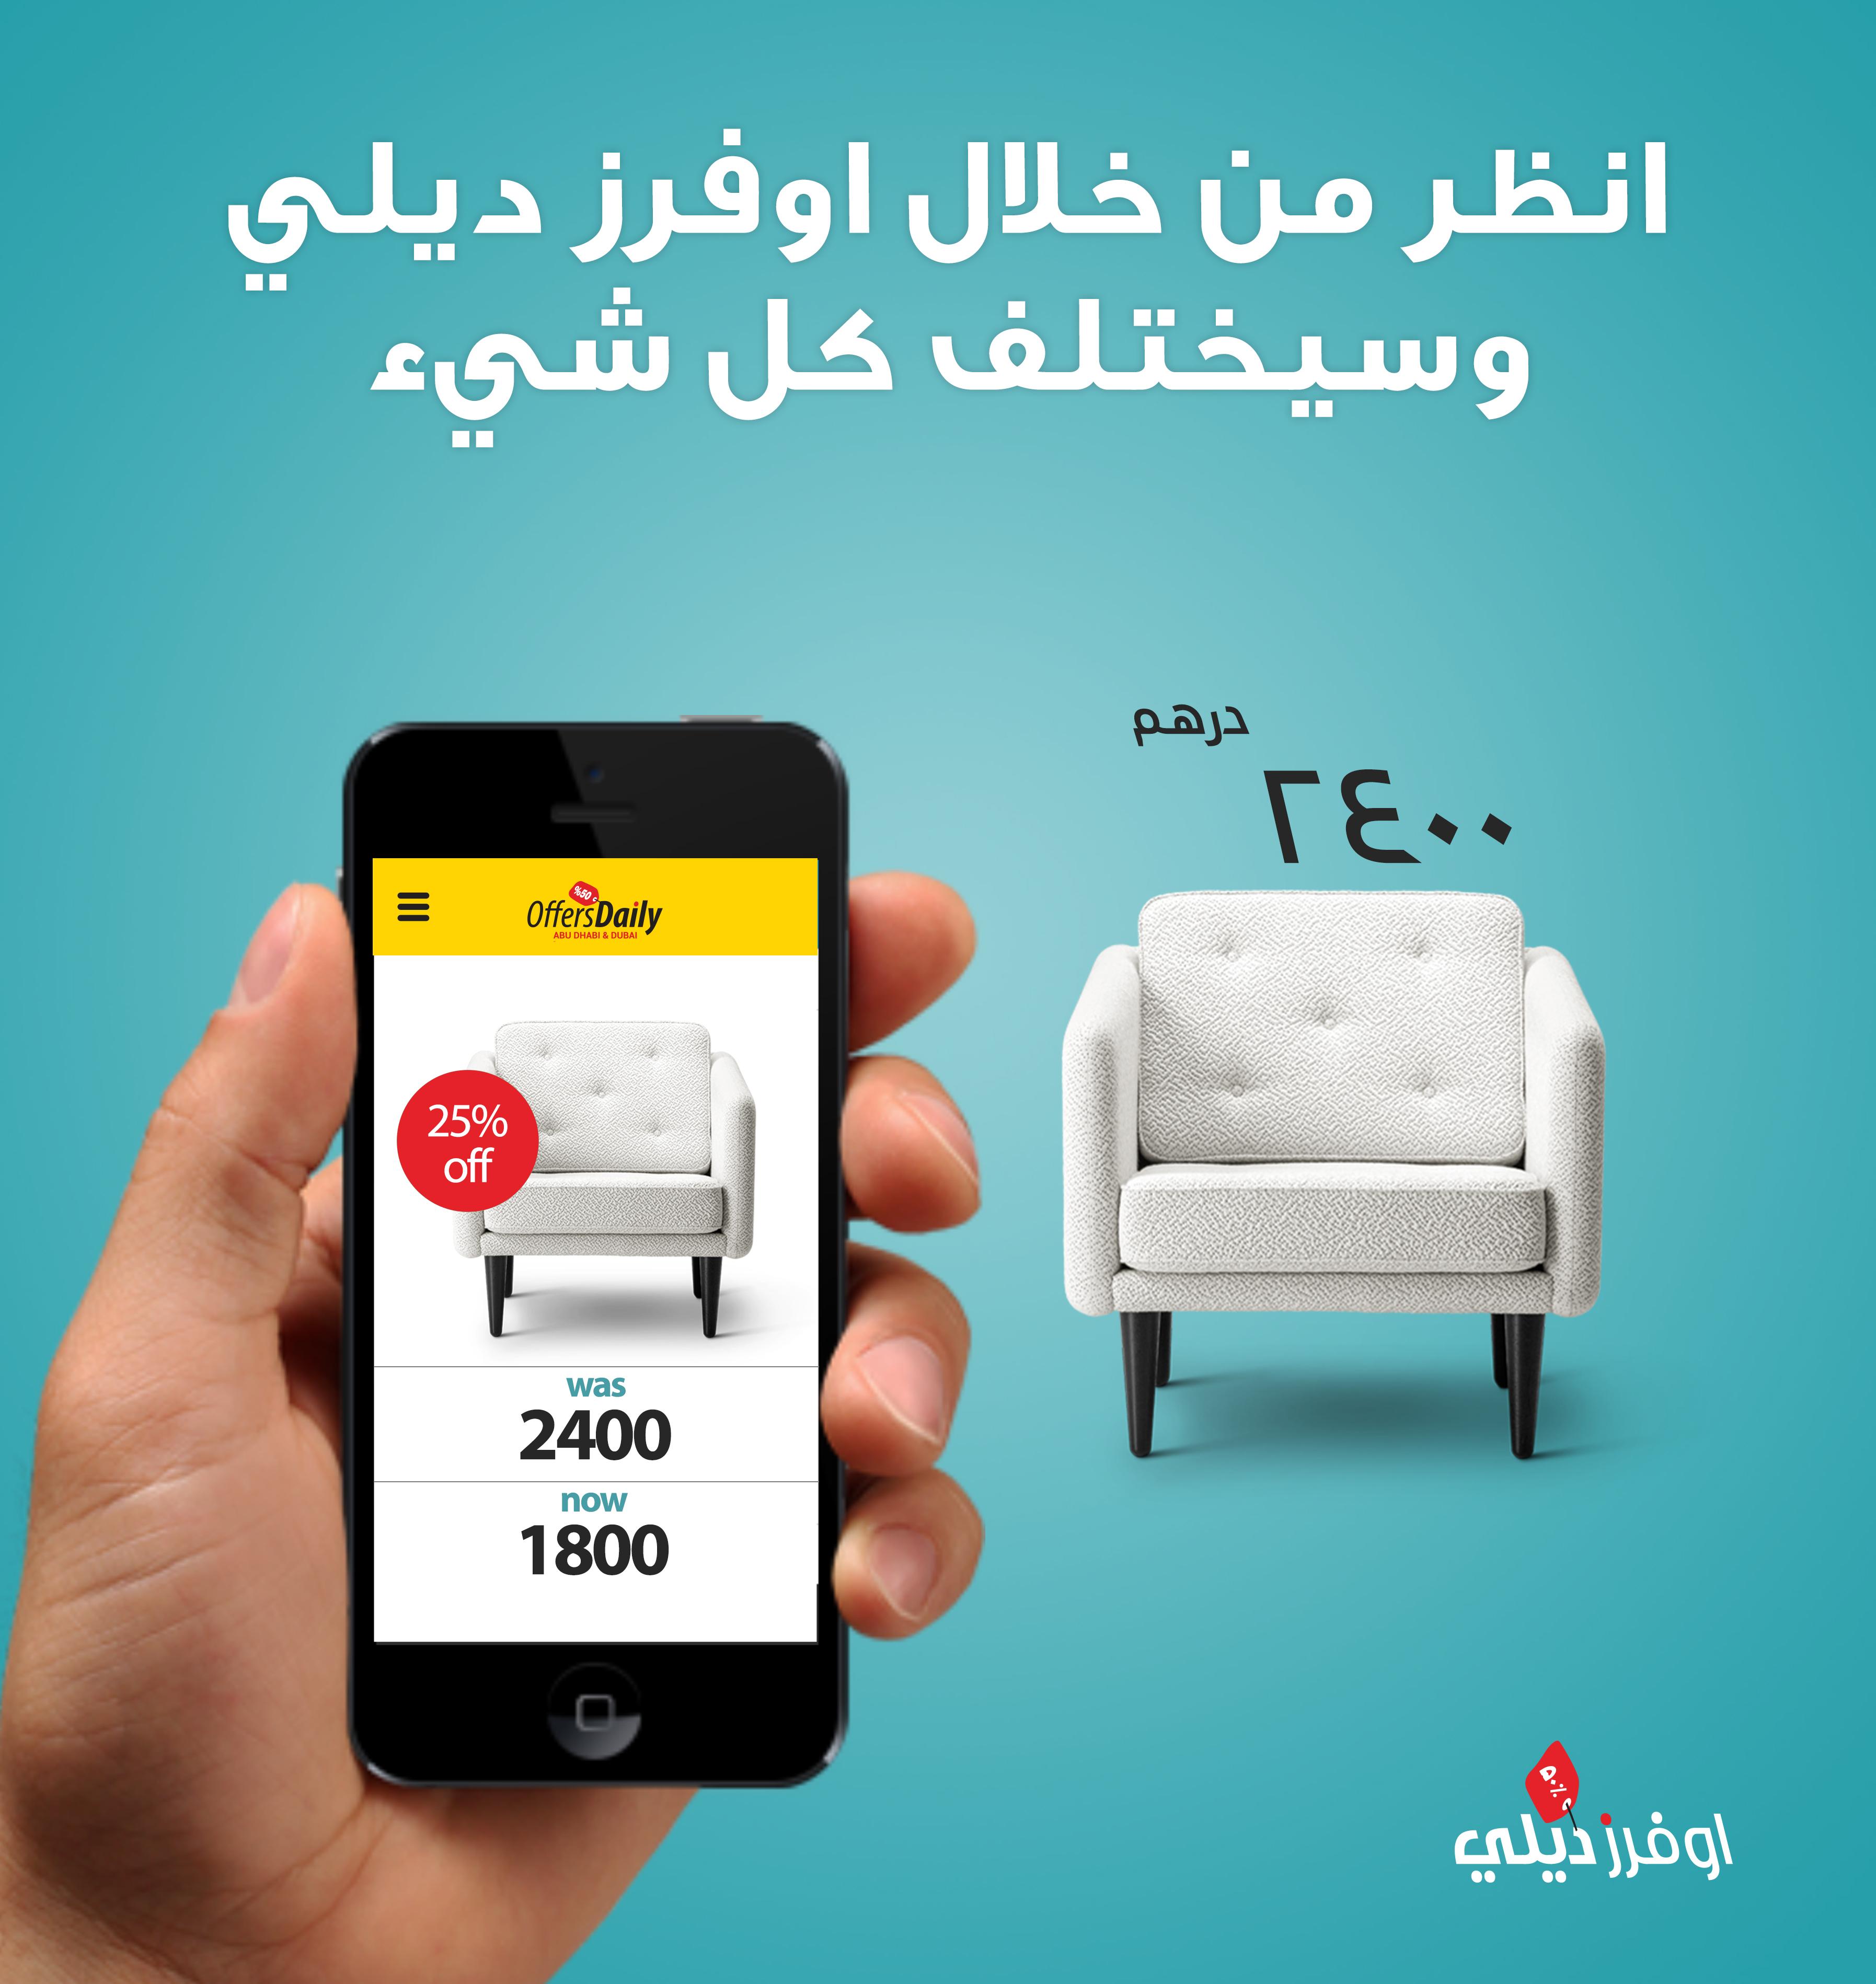 ABu Dhabi Marketing